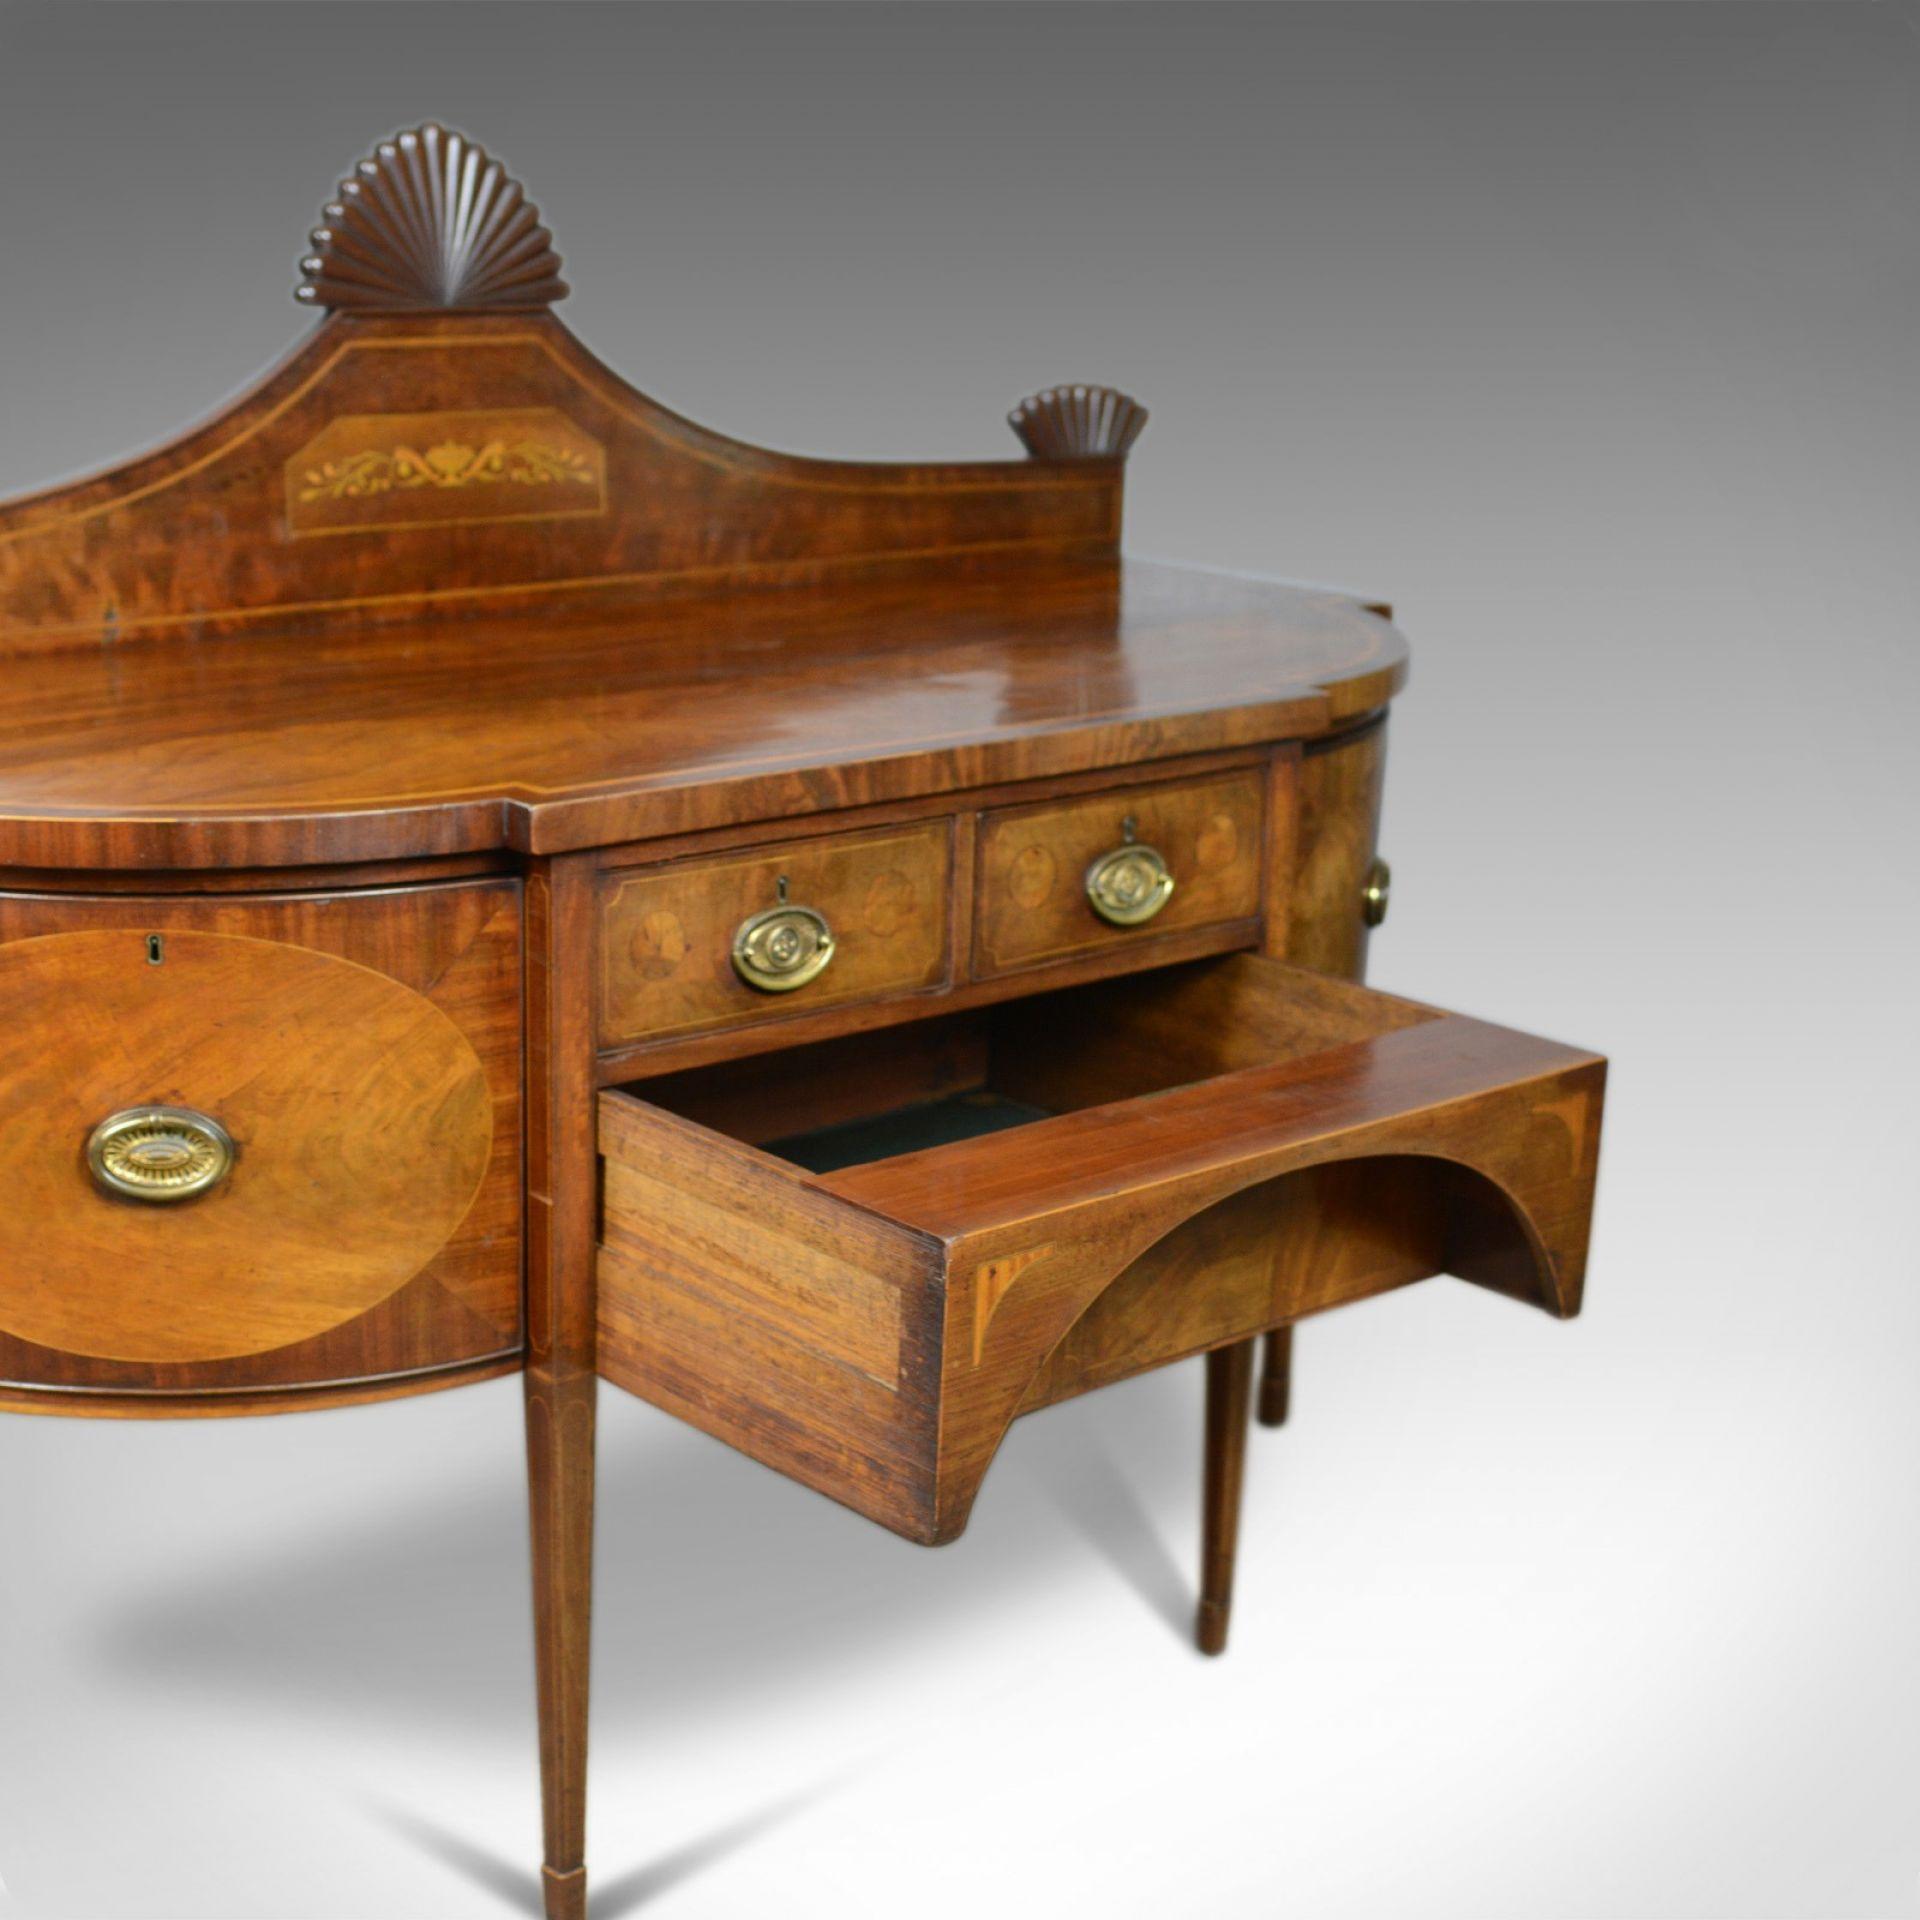 Large Antique Sideboard, English, Late Georgian, Server, Mahogany, Circa 1800